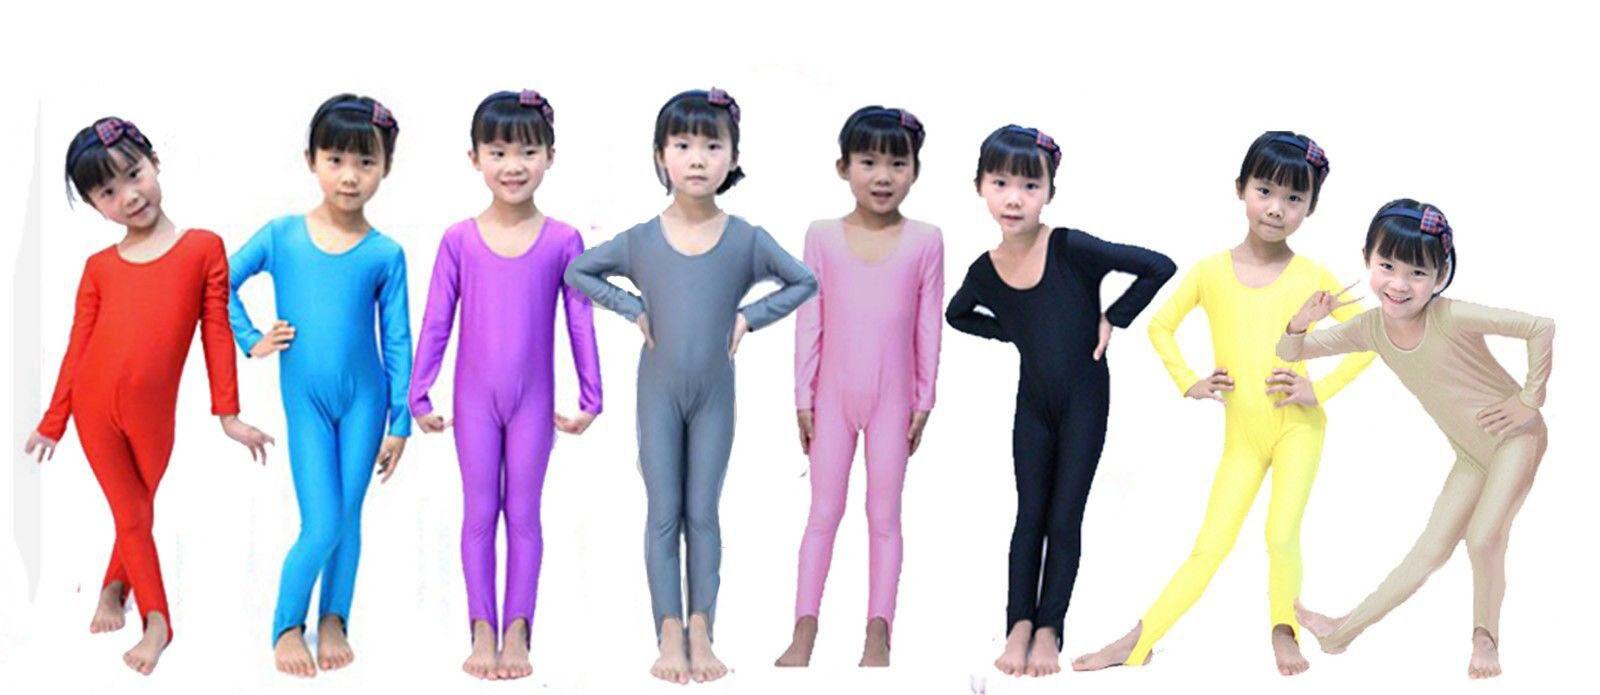 Kids Long Sleeve Dance Gymnastics Catsuit All In One Unitards Leotard Lycra